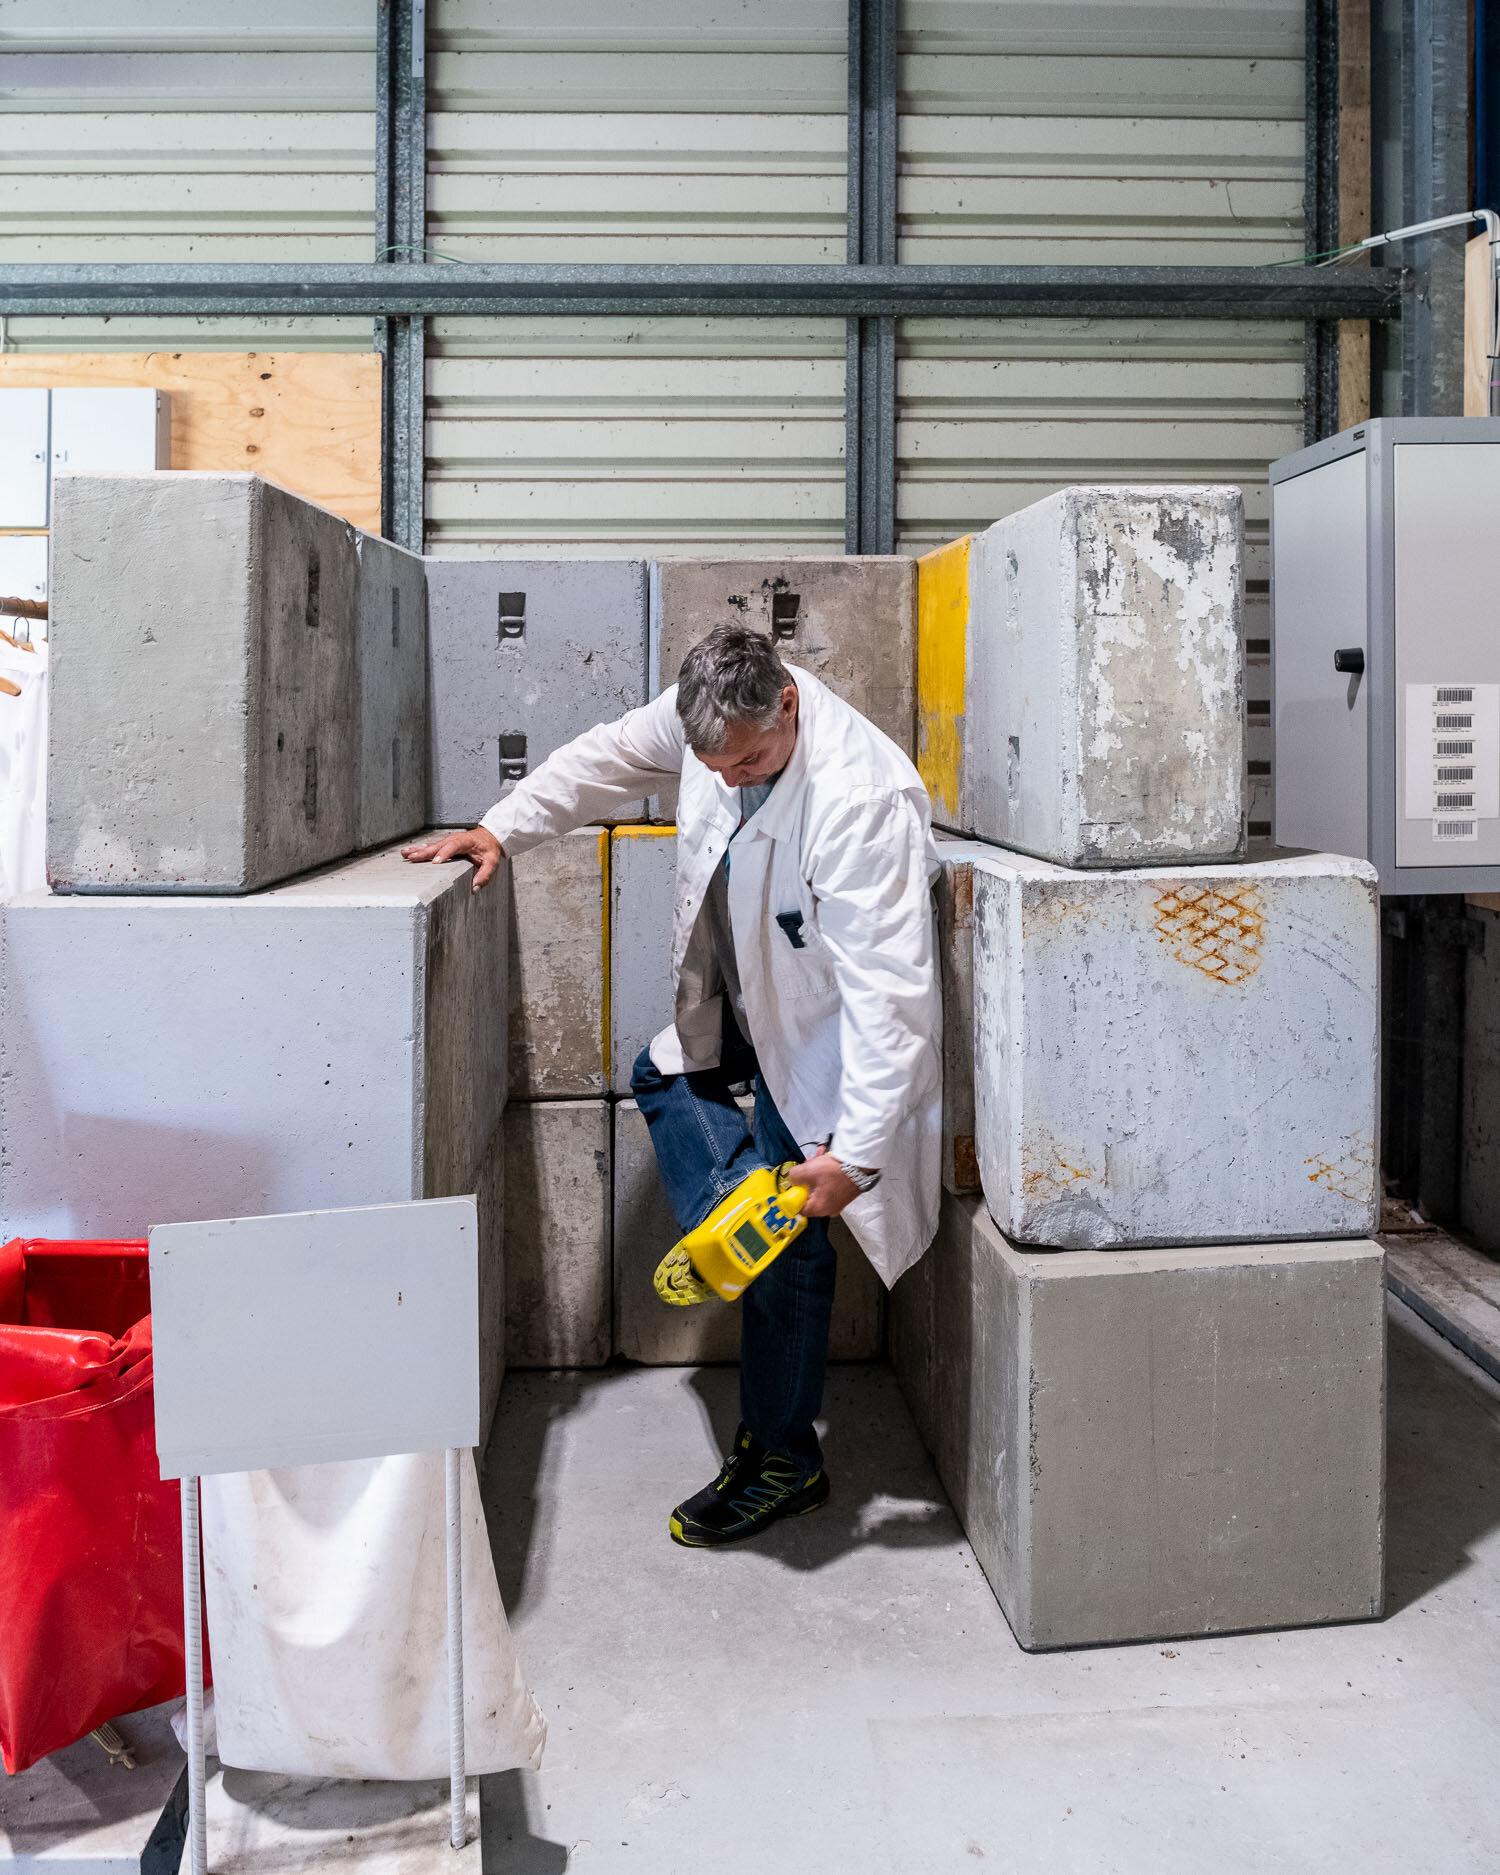 A contamination monitor checking radiation levels